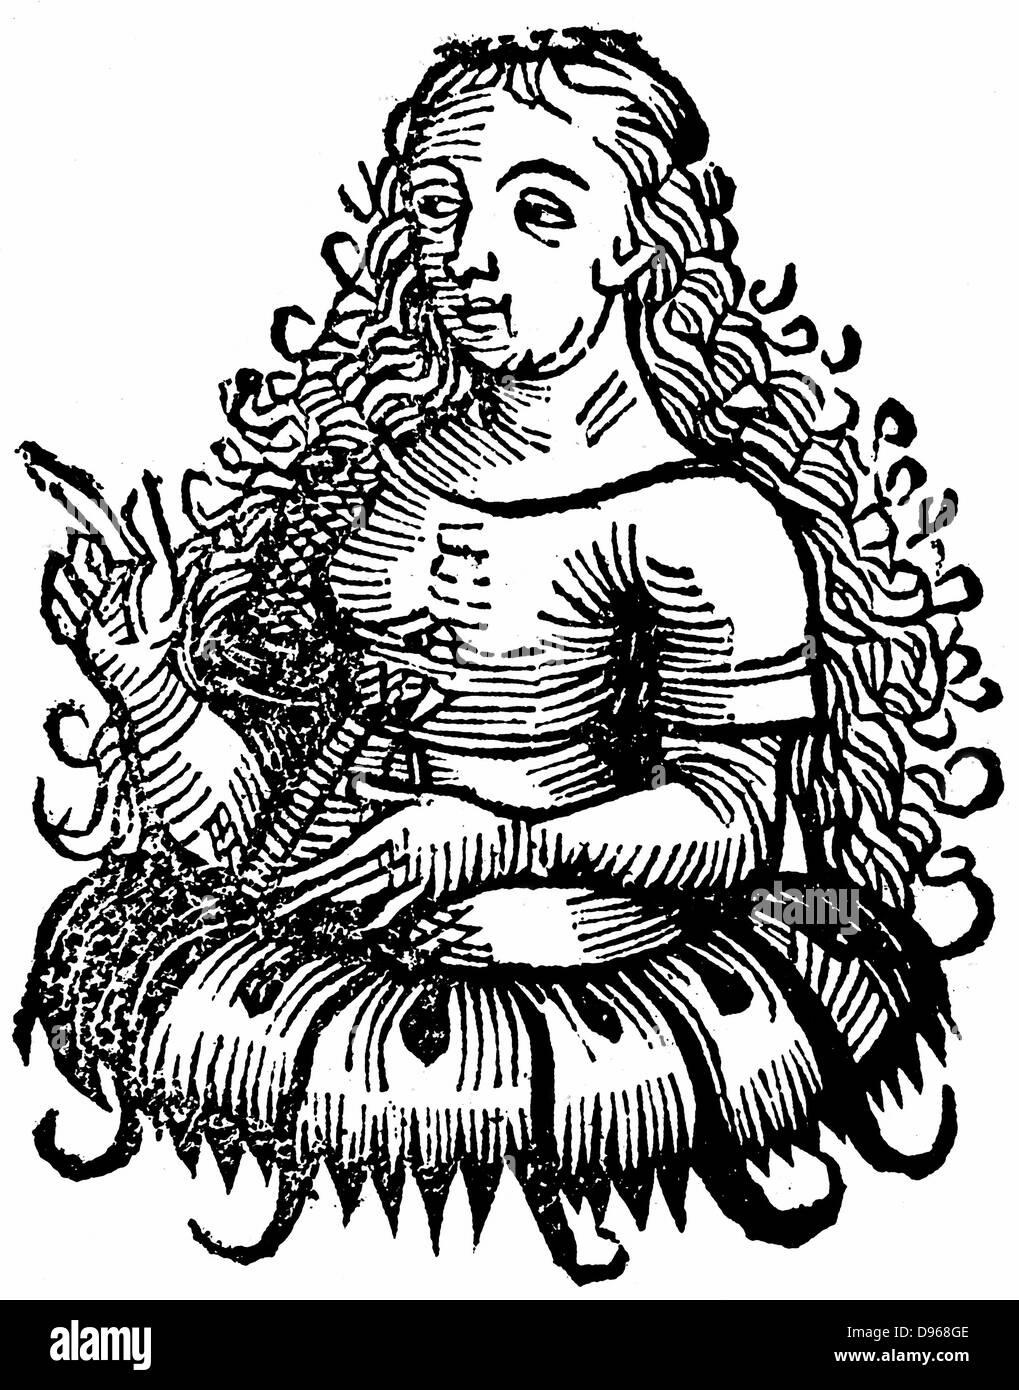 Cimmerian Sibyl: From Hartmann Schedel 'Liber chronicarum mundi' (Nuremberg Chronicle) Nuremberg 1493. Woodcut - Stock Image